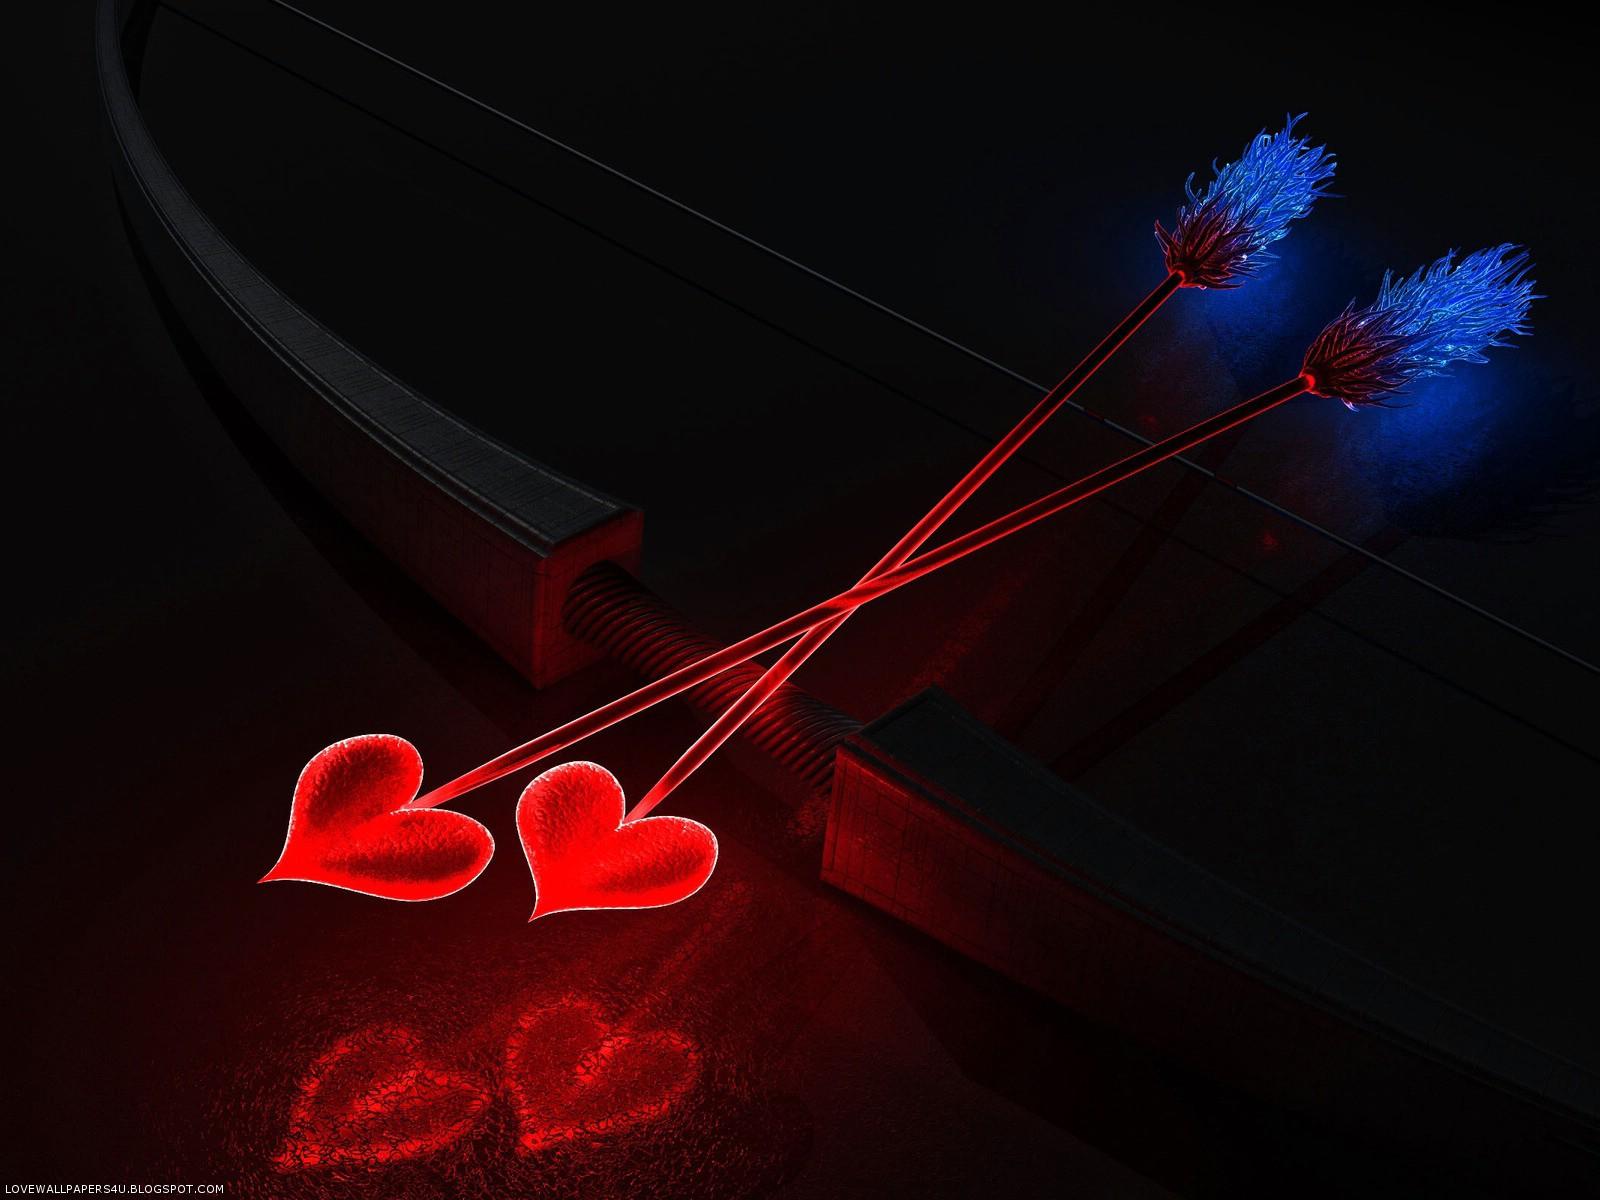 http://1.bp.blogspot.com/-SrnG8u2ODJs/UBKelDcZa4I/AAAAAAAABGY/J_C99blYxHQ/s1600/heart-wallpaper+%25283%2529.jpg